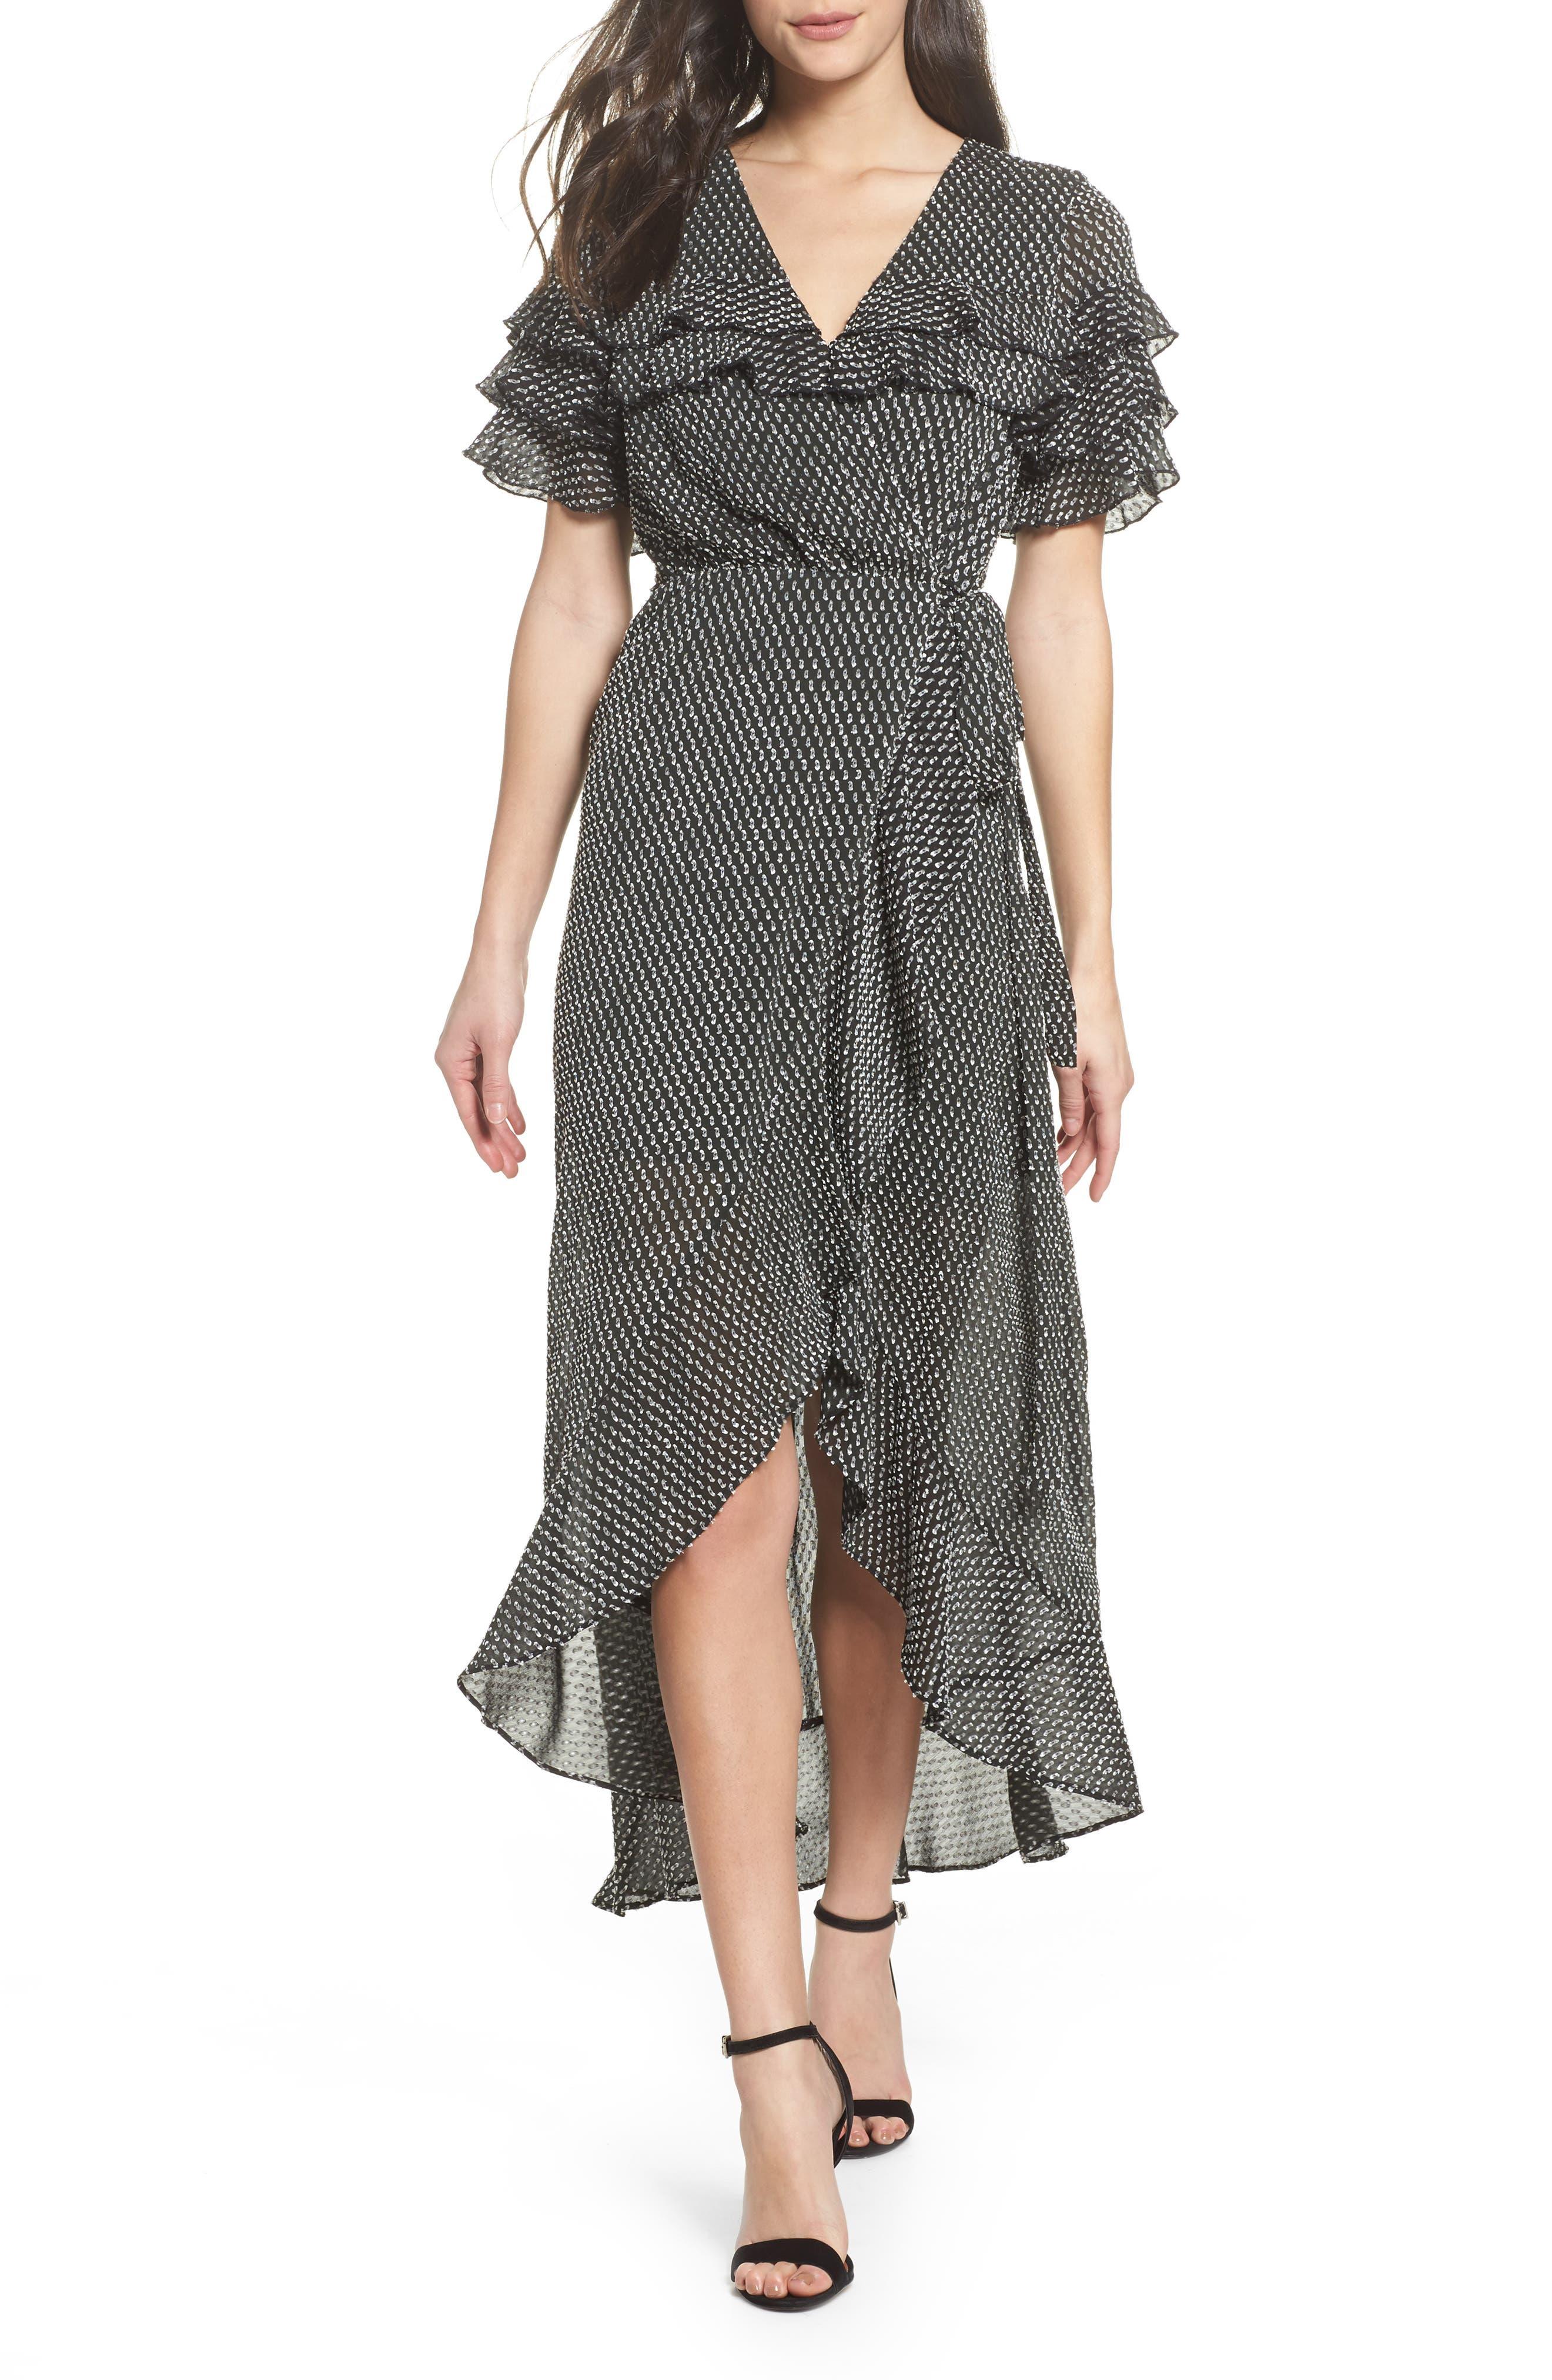 Alternate Image 1 Selected - Ali & Jay YOLO Ruffle Wrap Dress